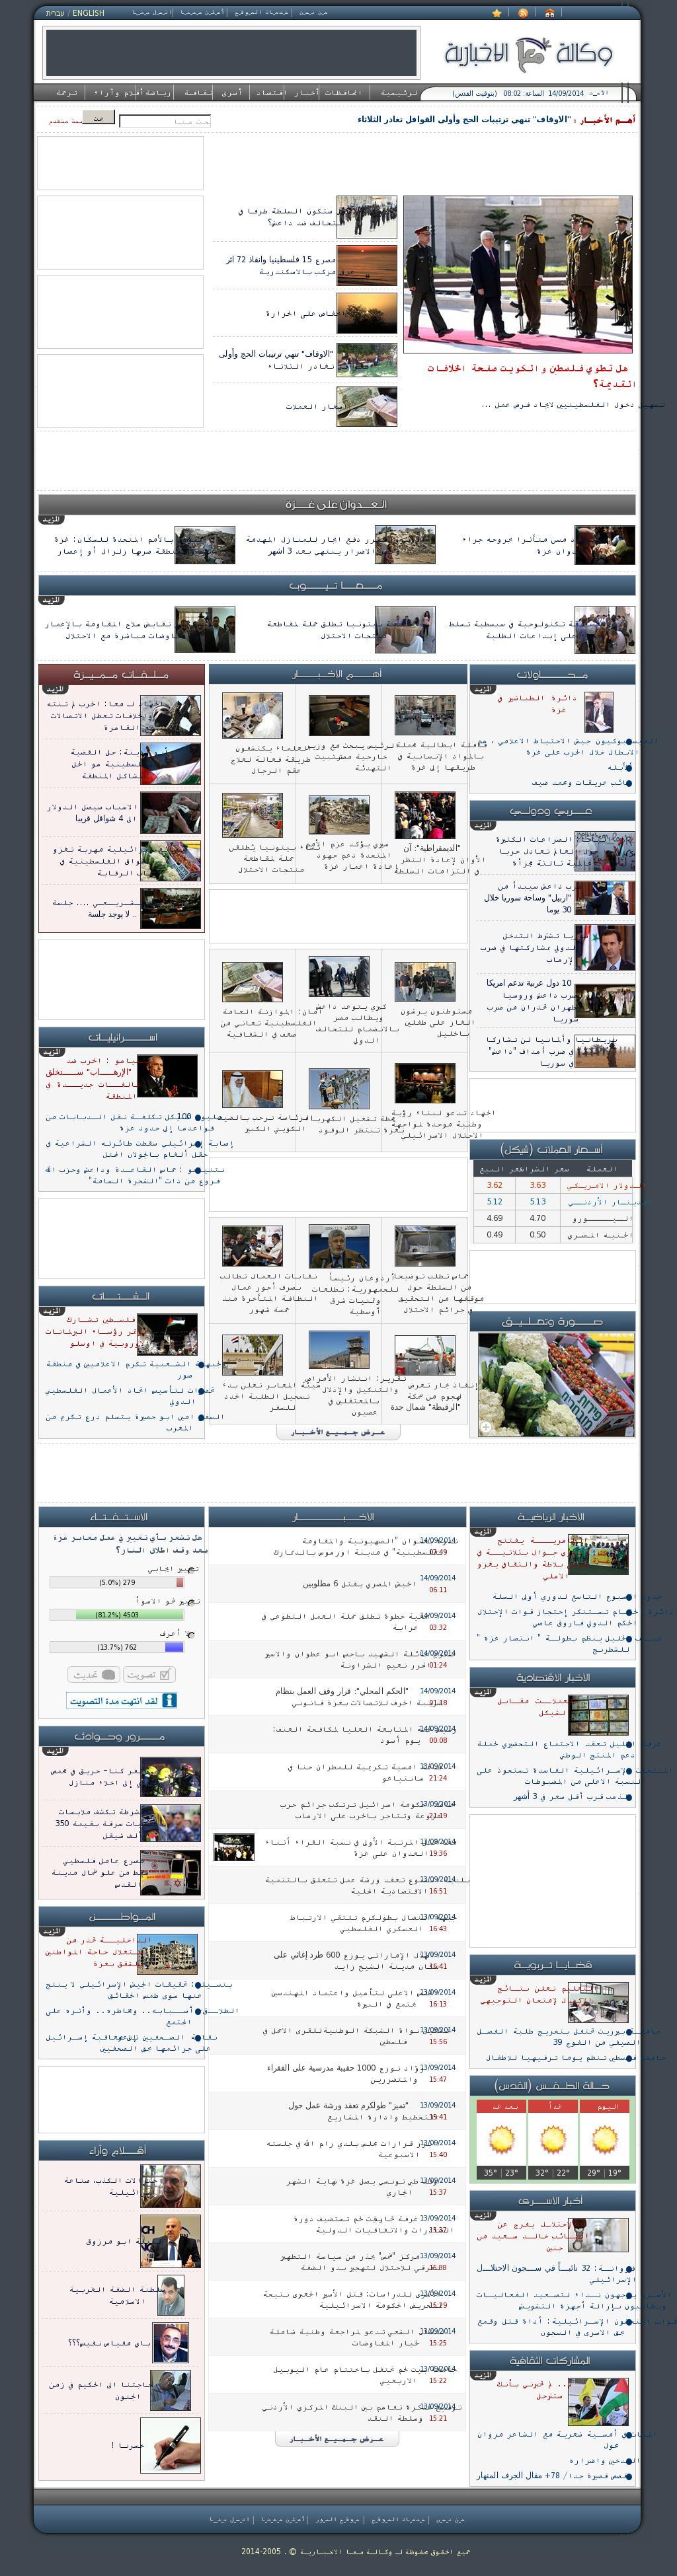 Ma'an News at Sunday Sept. 14, 2014, 5:09 a.m. UTC